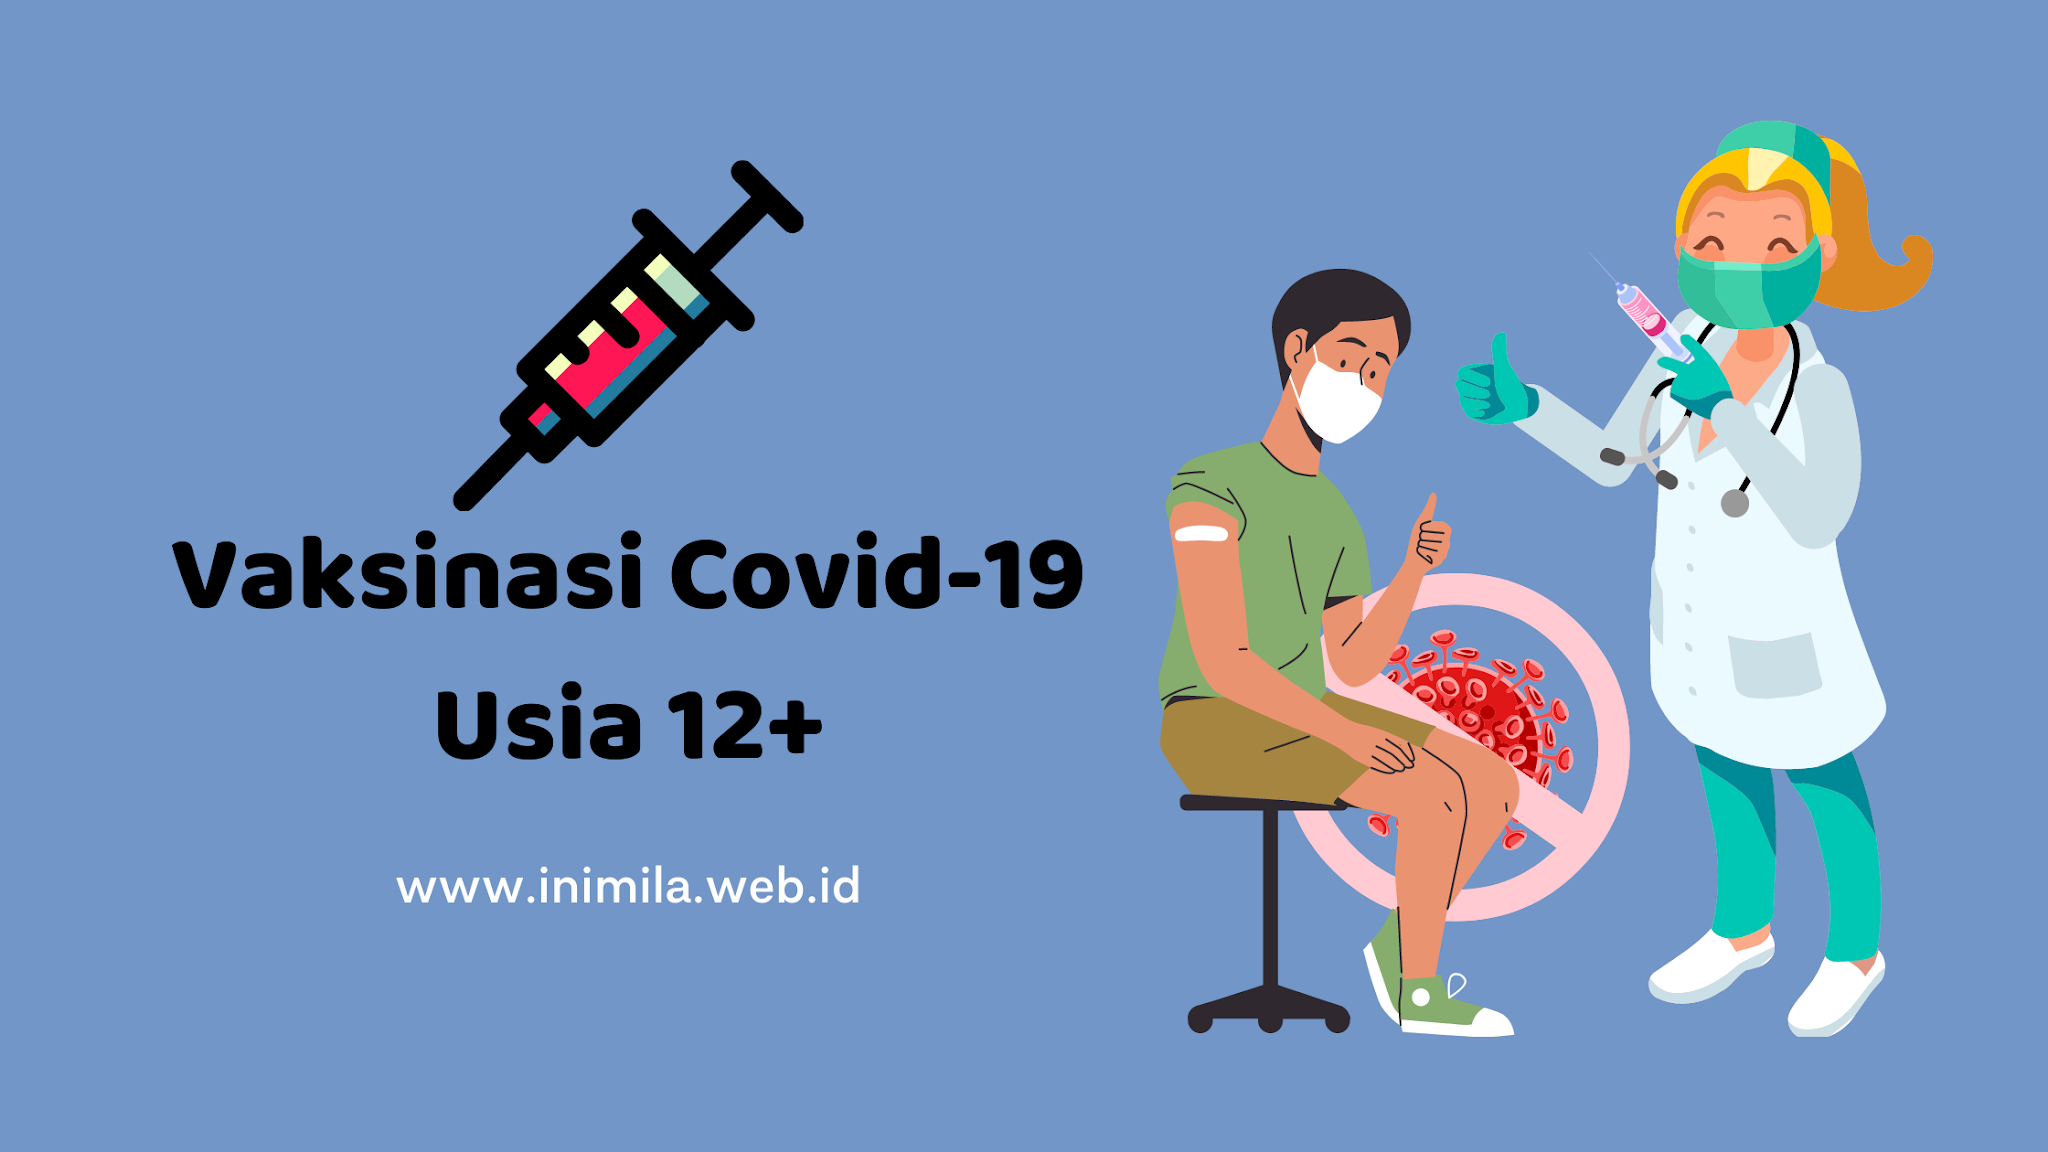 vaksinasi-covid-19-cemil